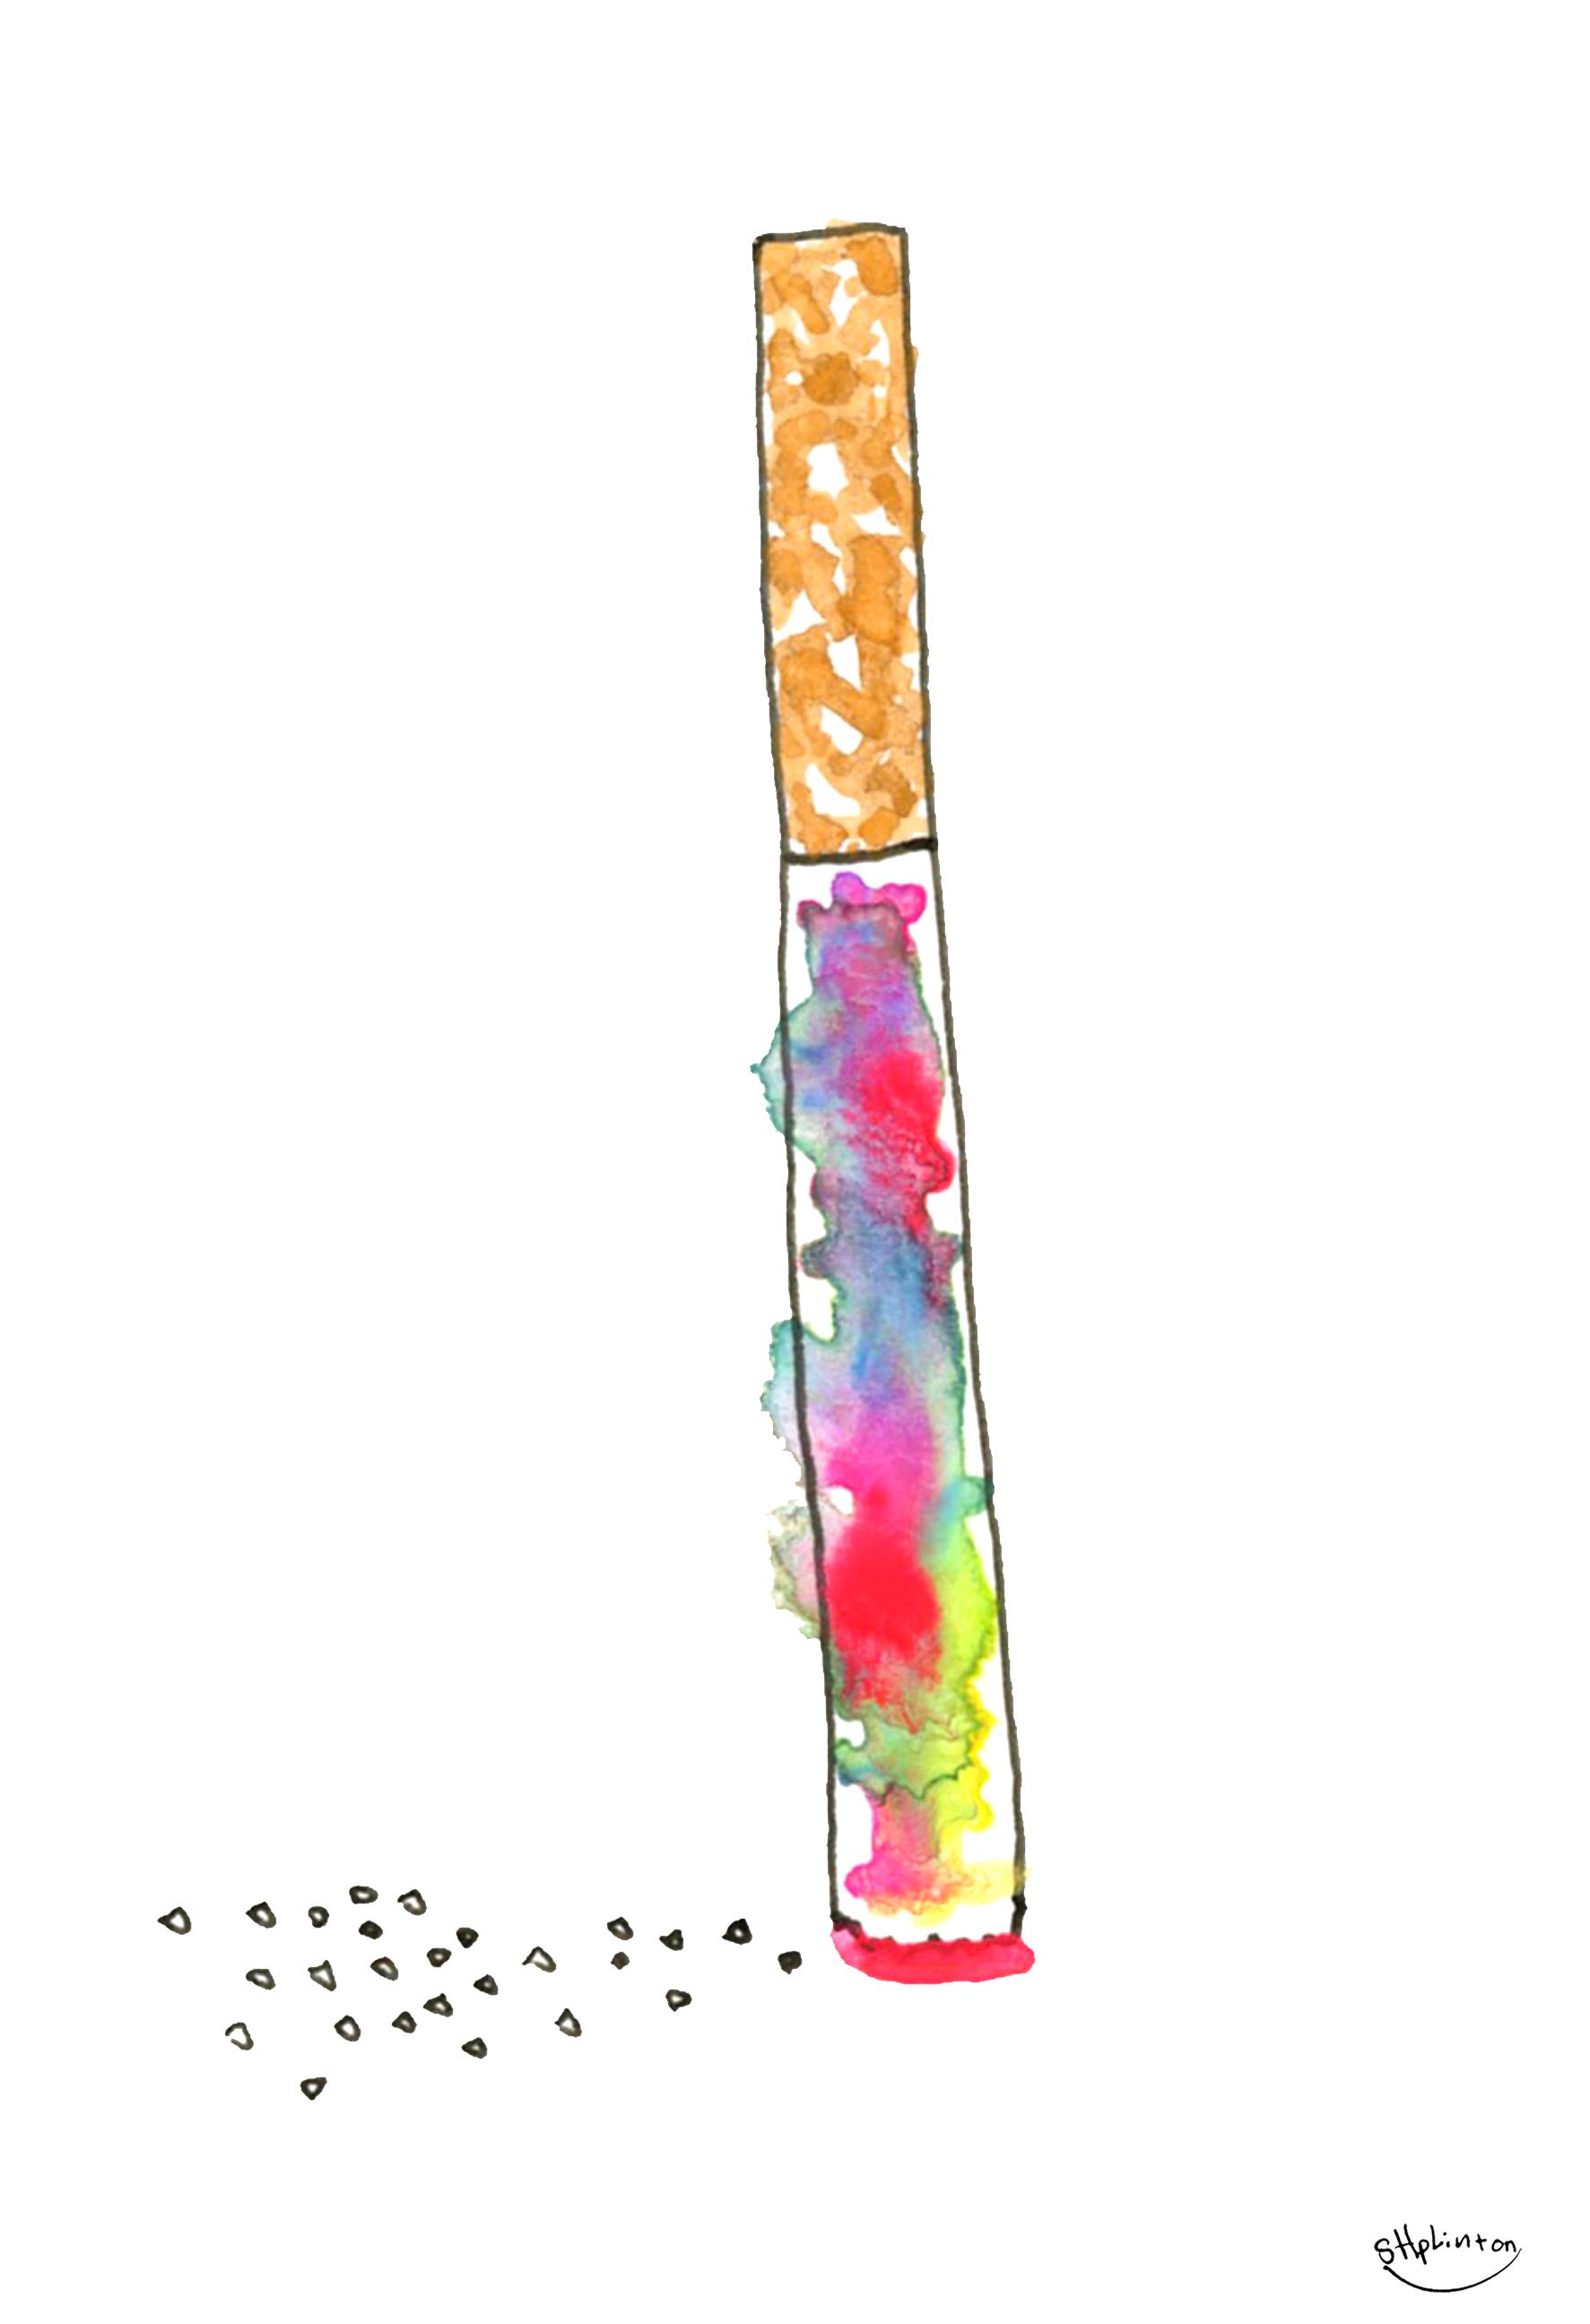 12x18_Print_Colorsmoke.jpg